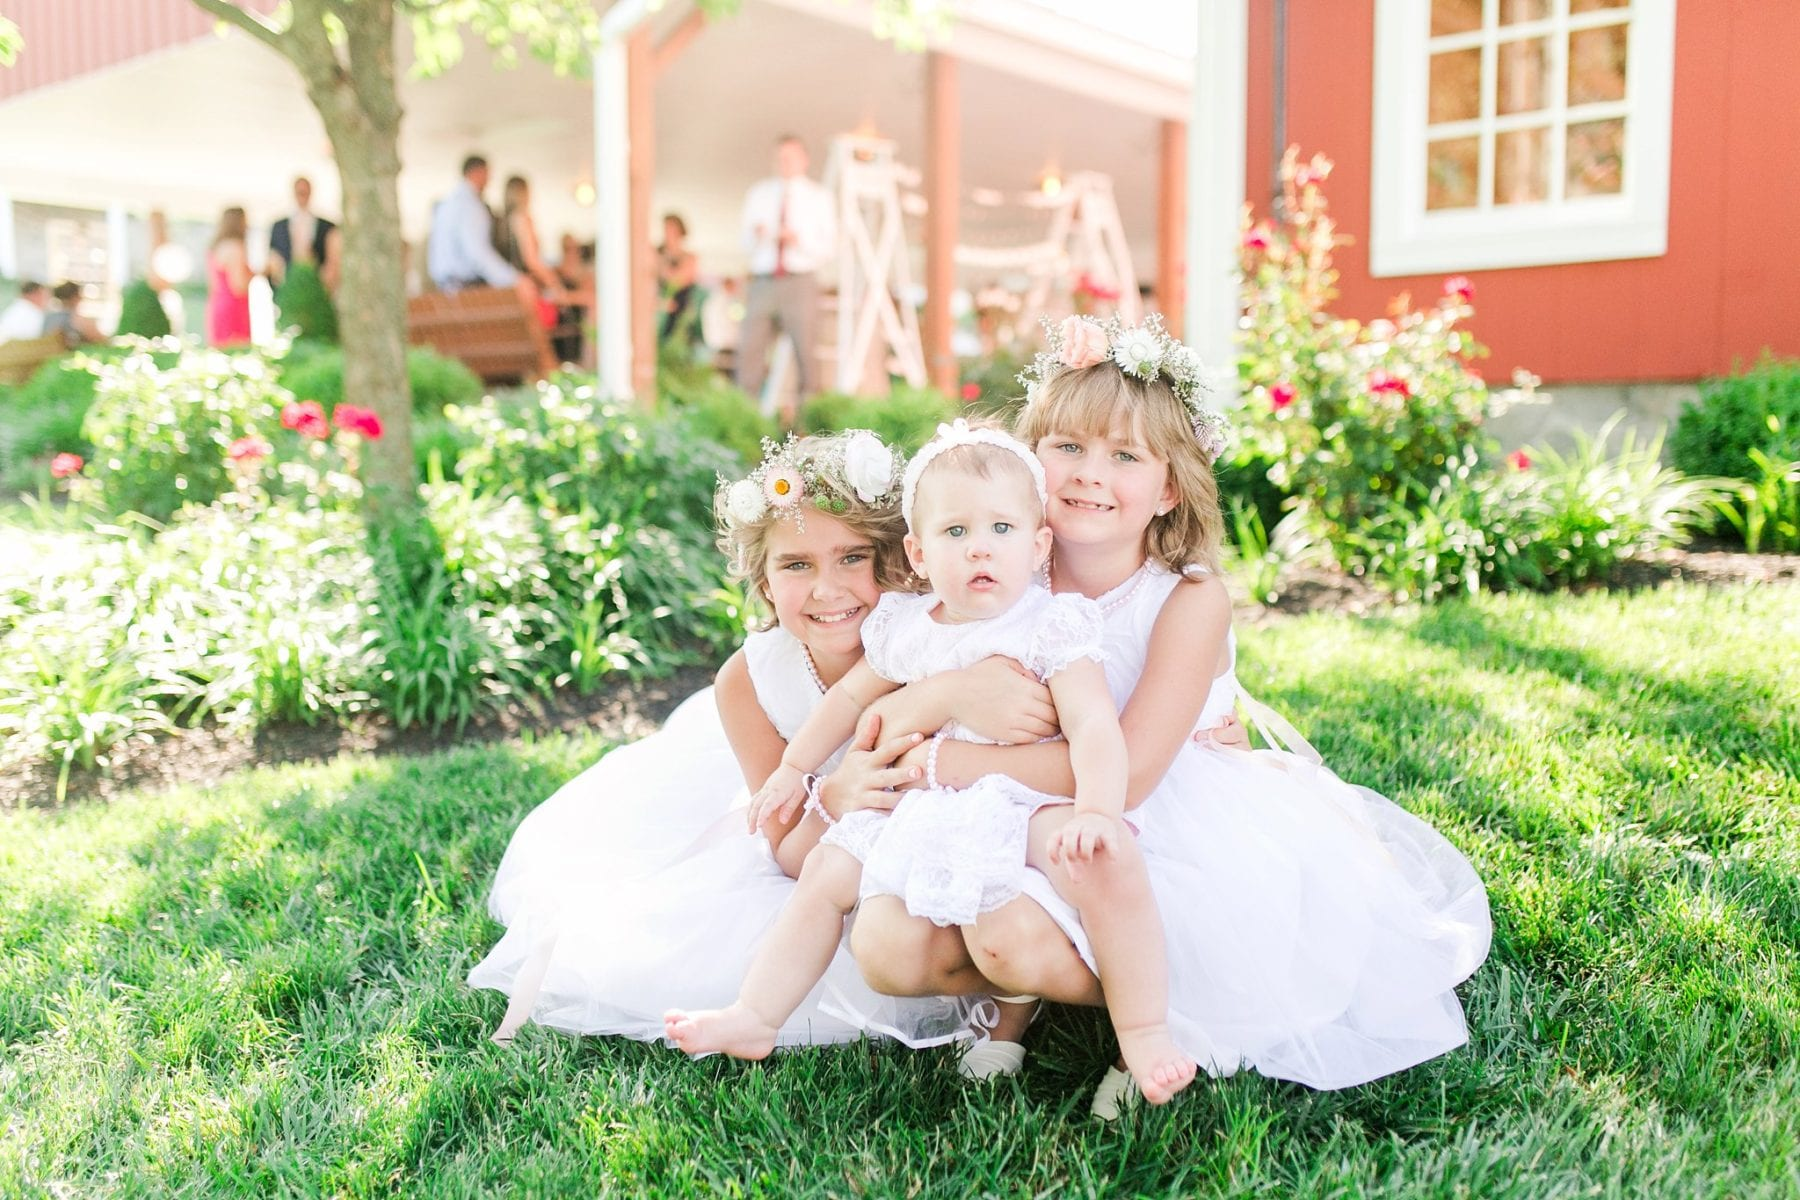 Pond View Farm Wedding Photos Maryland Wedding Photographer Kristen & Ryan Megan Kelsey Photography Blog-157.jpg